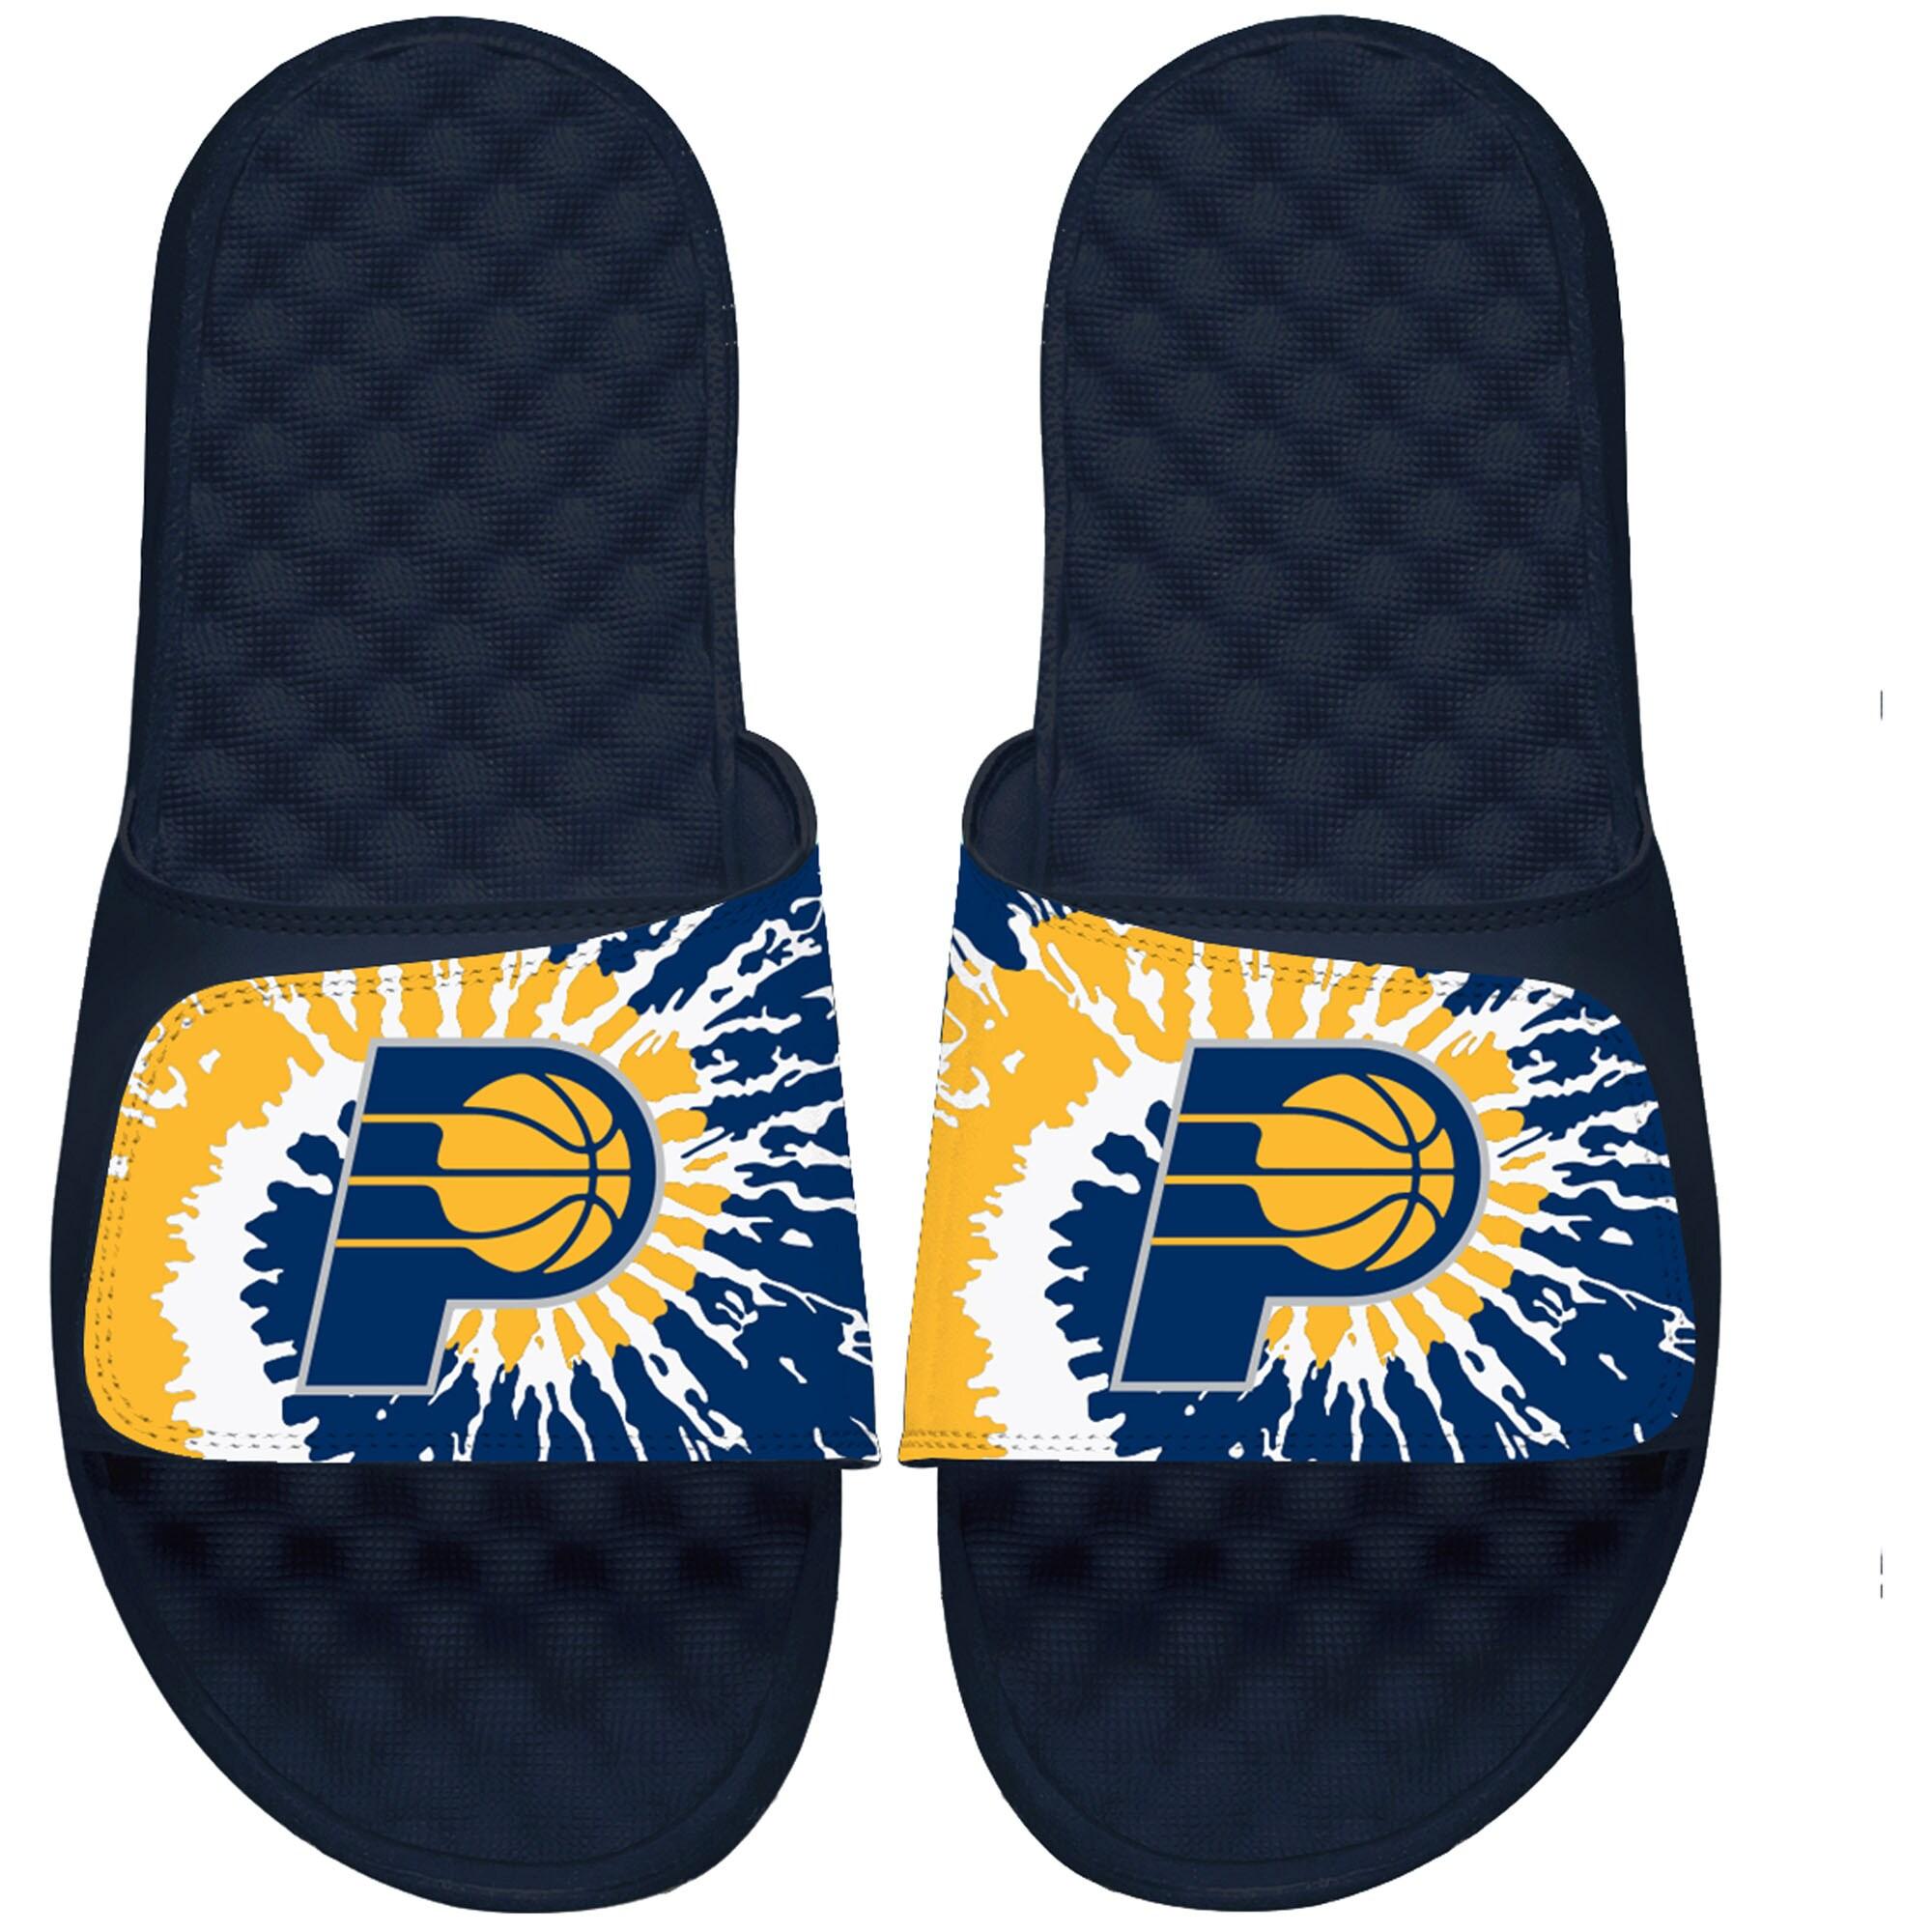 Indiana Pacers ISlide Tie Dye Slide Sandals - Navy